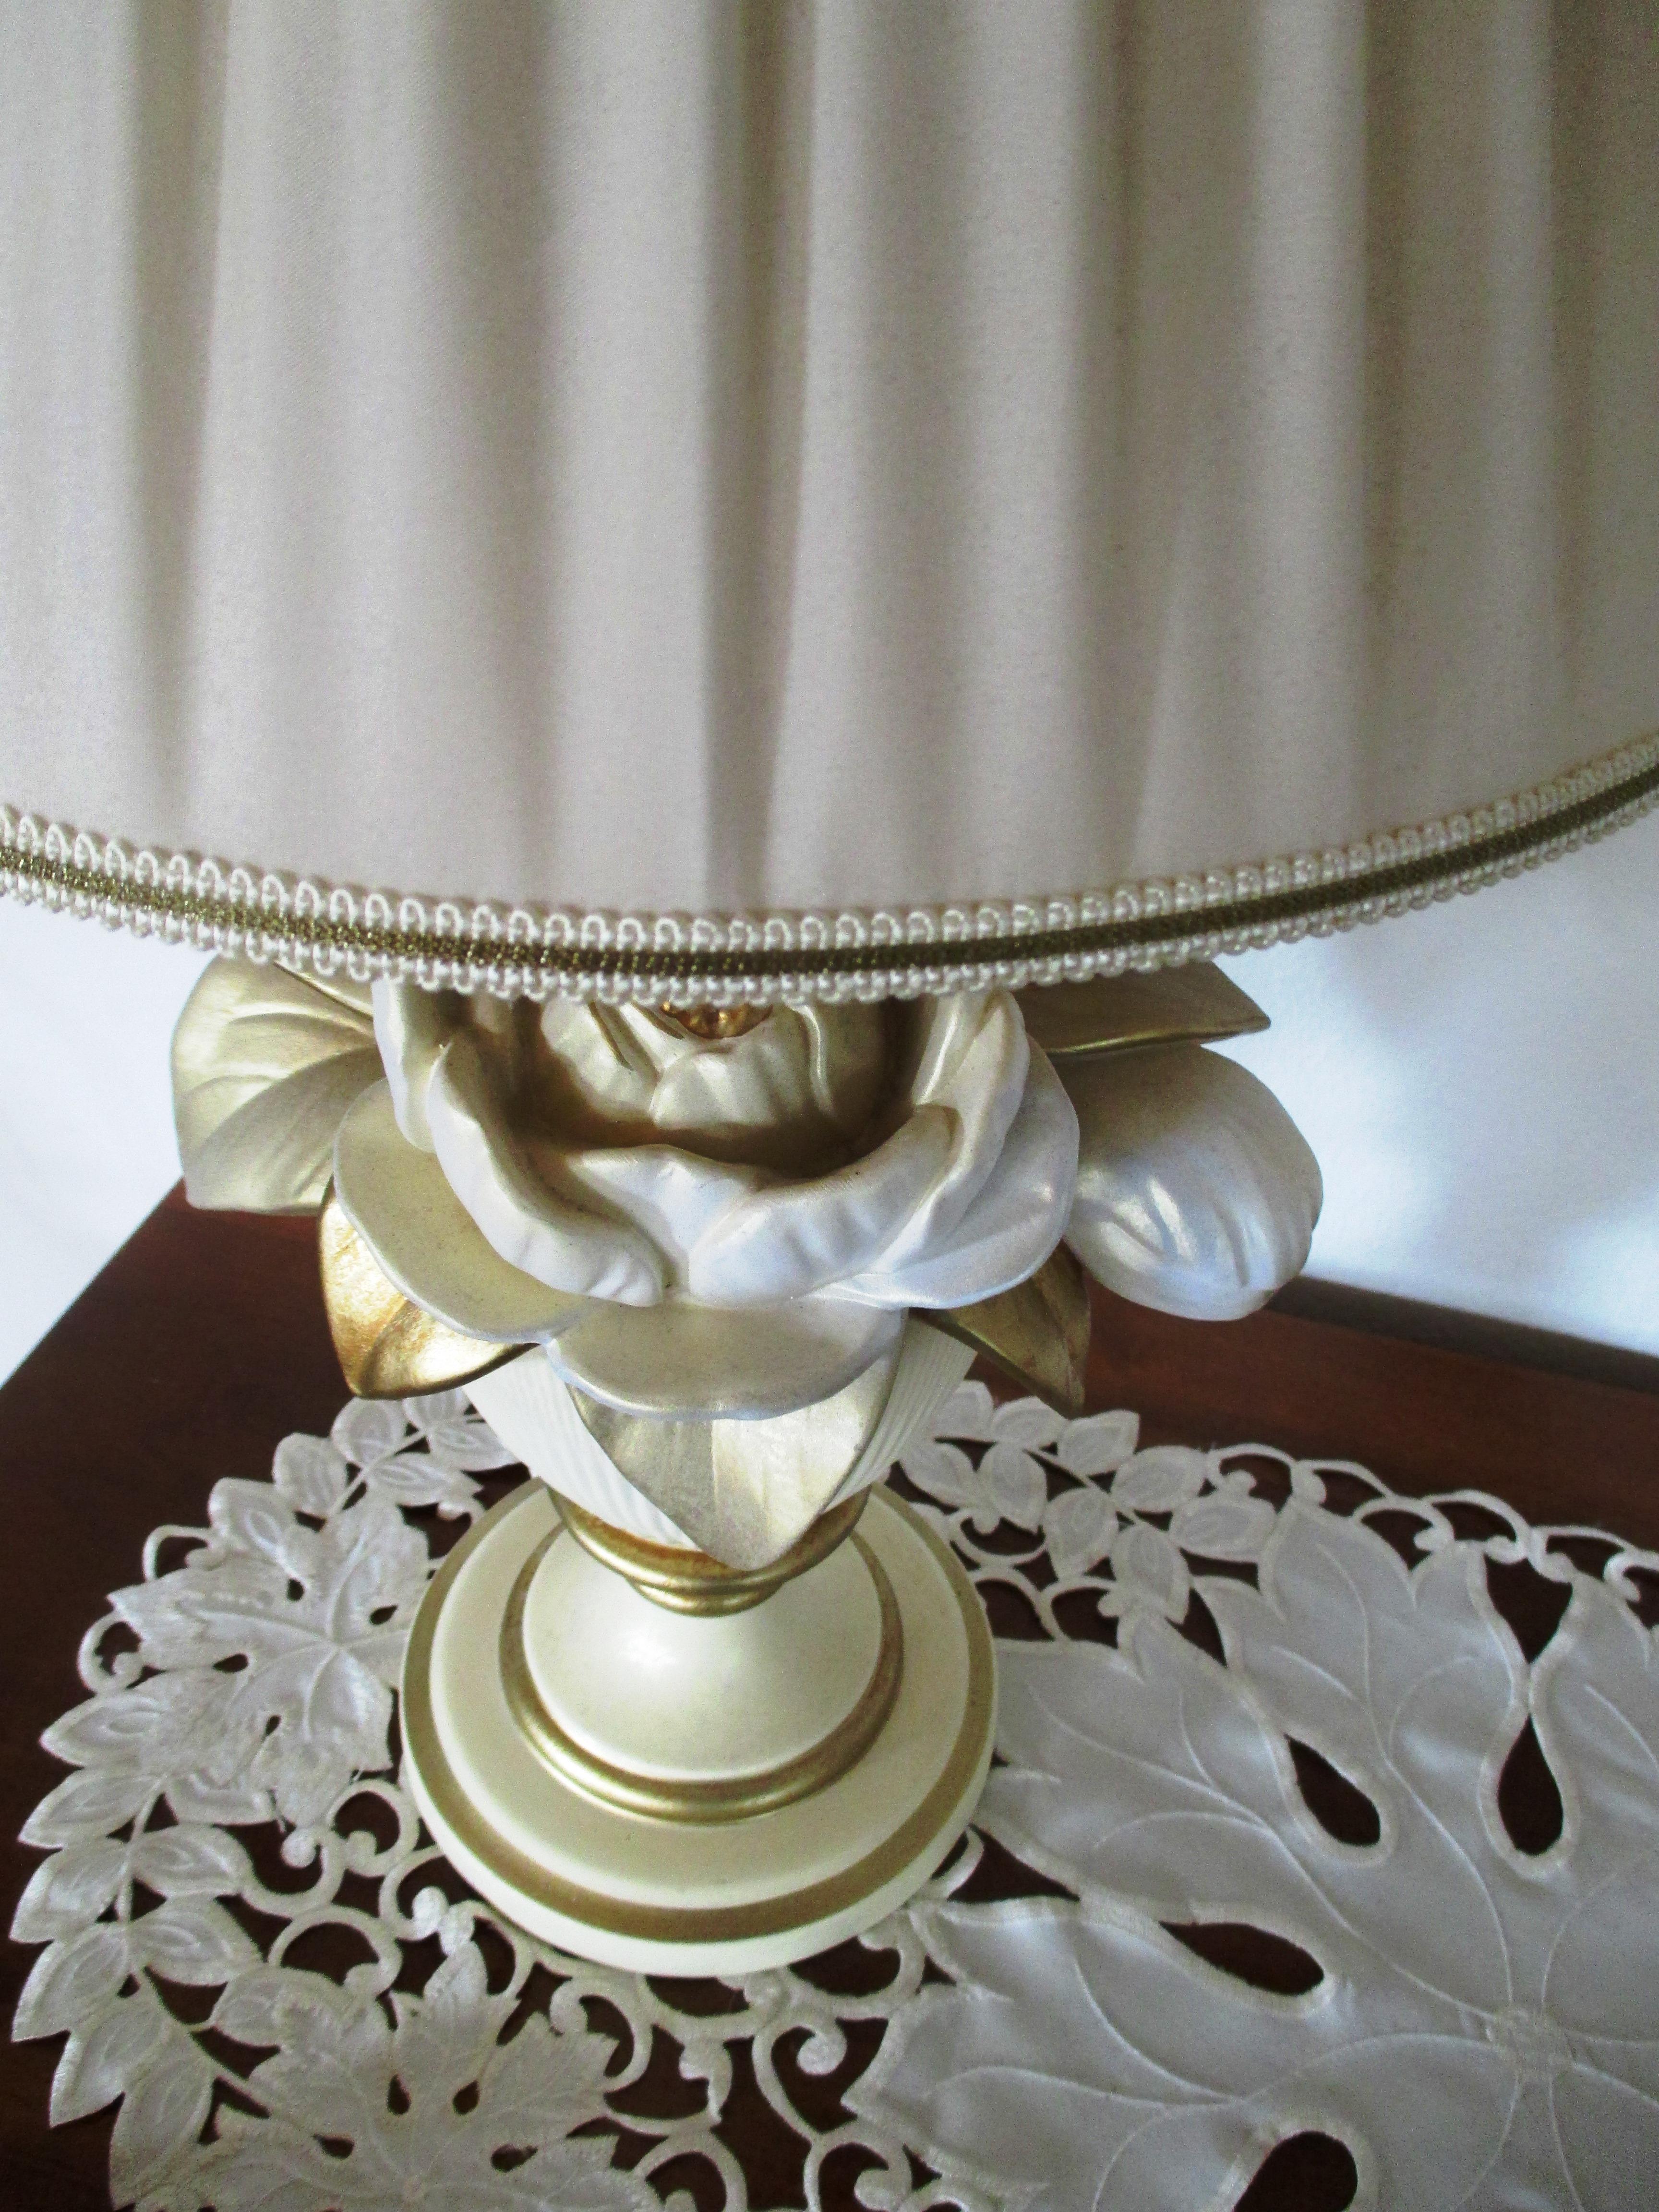 d7f42cf6 ... belysning, materiale, bordduk, stoff, dekorative, stikkontakt,  bordlampe, porselen, broderi, kommode, bryllupskake, servise, rose motiv  3456x4608